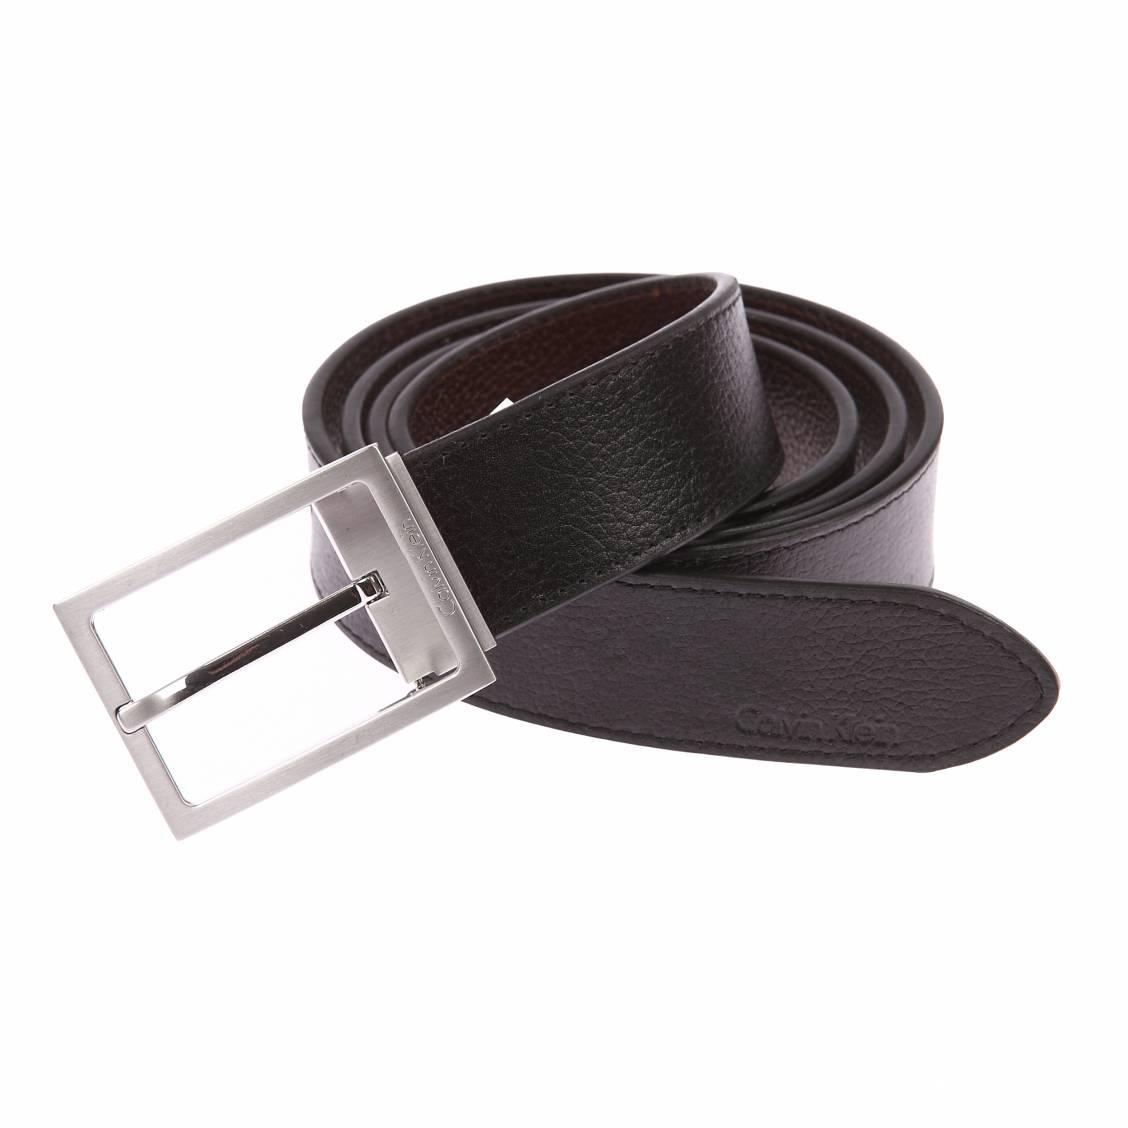 coffret ceinture ajustable calvin klein jeans en cuir. Black Bedroom Furniture Sets. Home Design Ideas